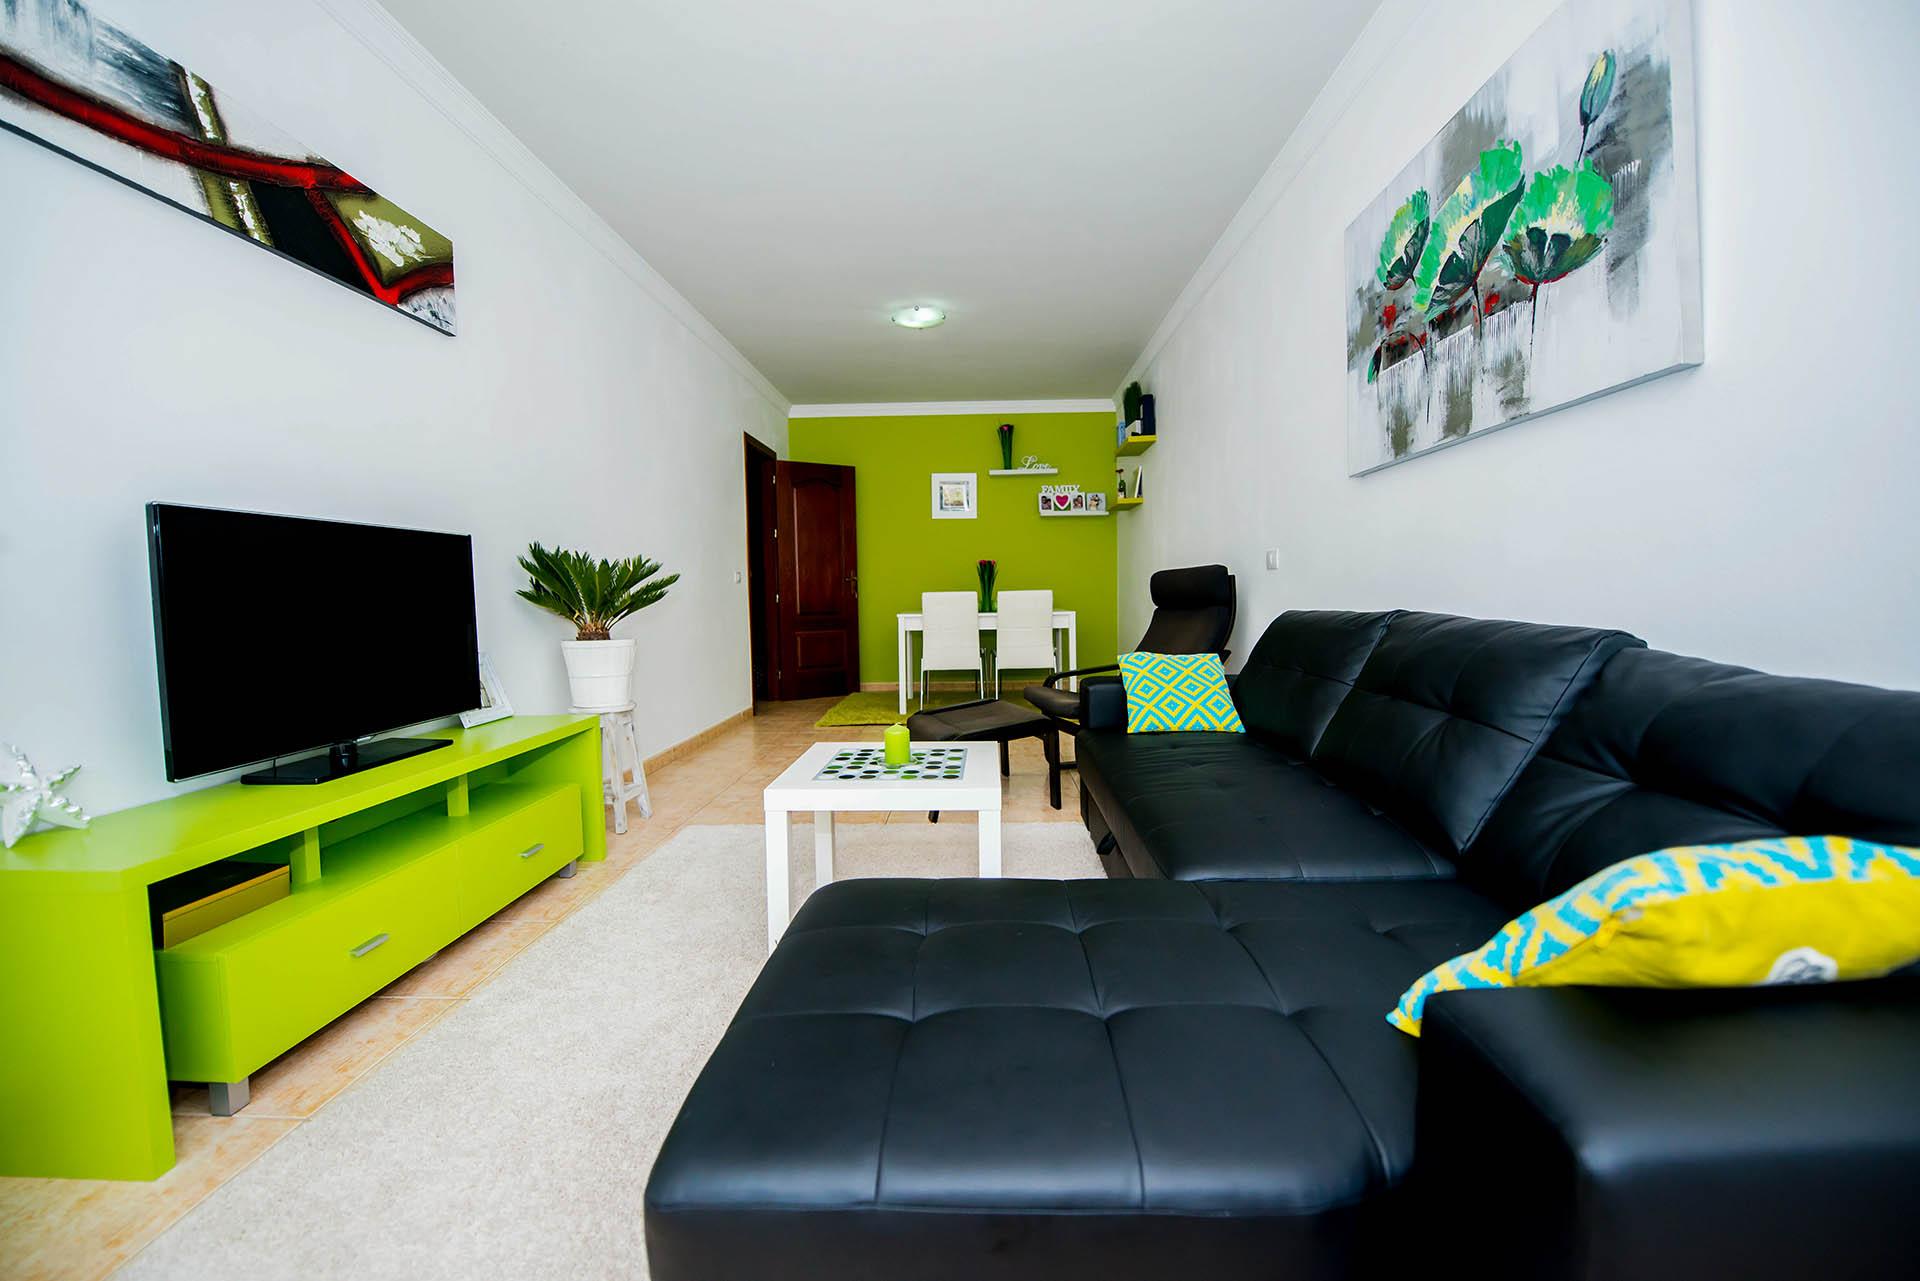 公寓 为 销售 在 Edificio Veril Calle Tenerife Adeje, Tenerife Canary Islands 38660 西班牙